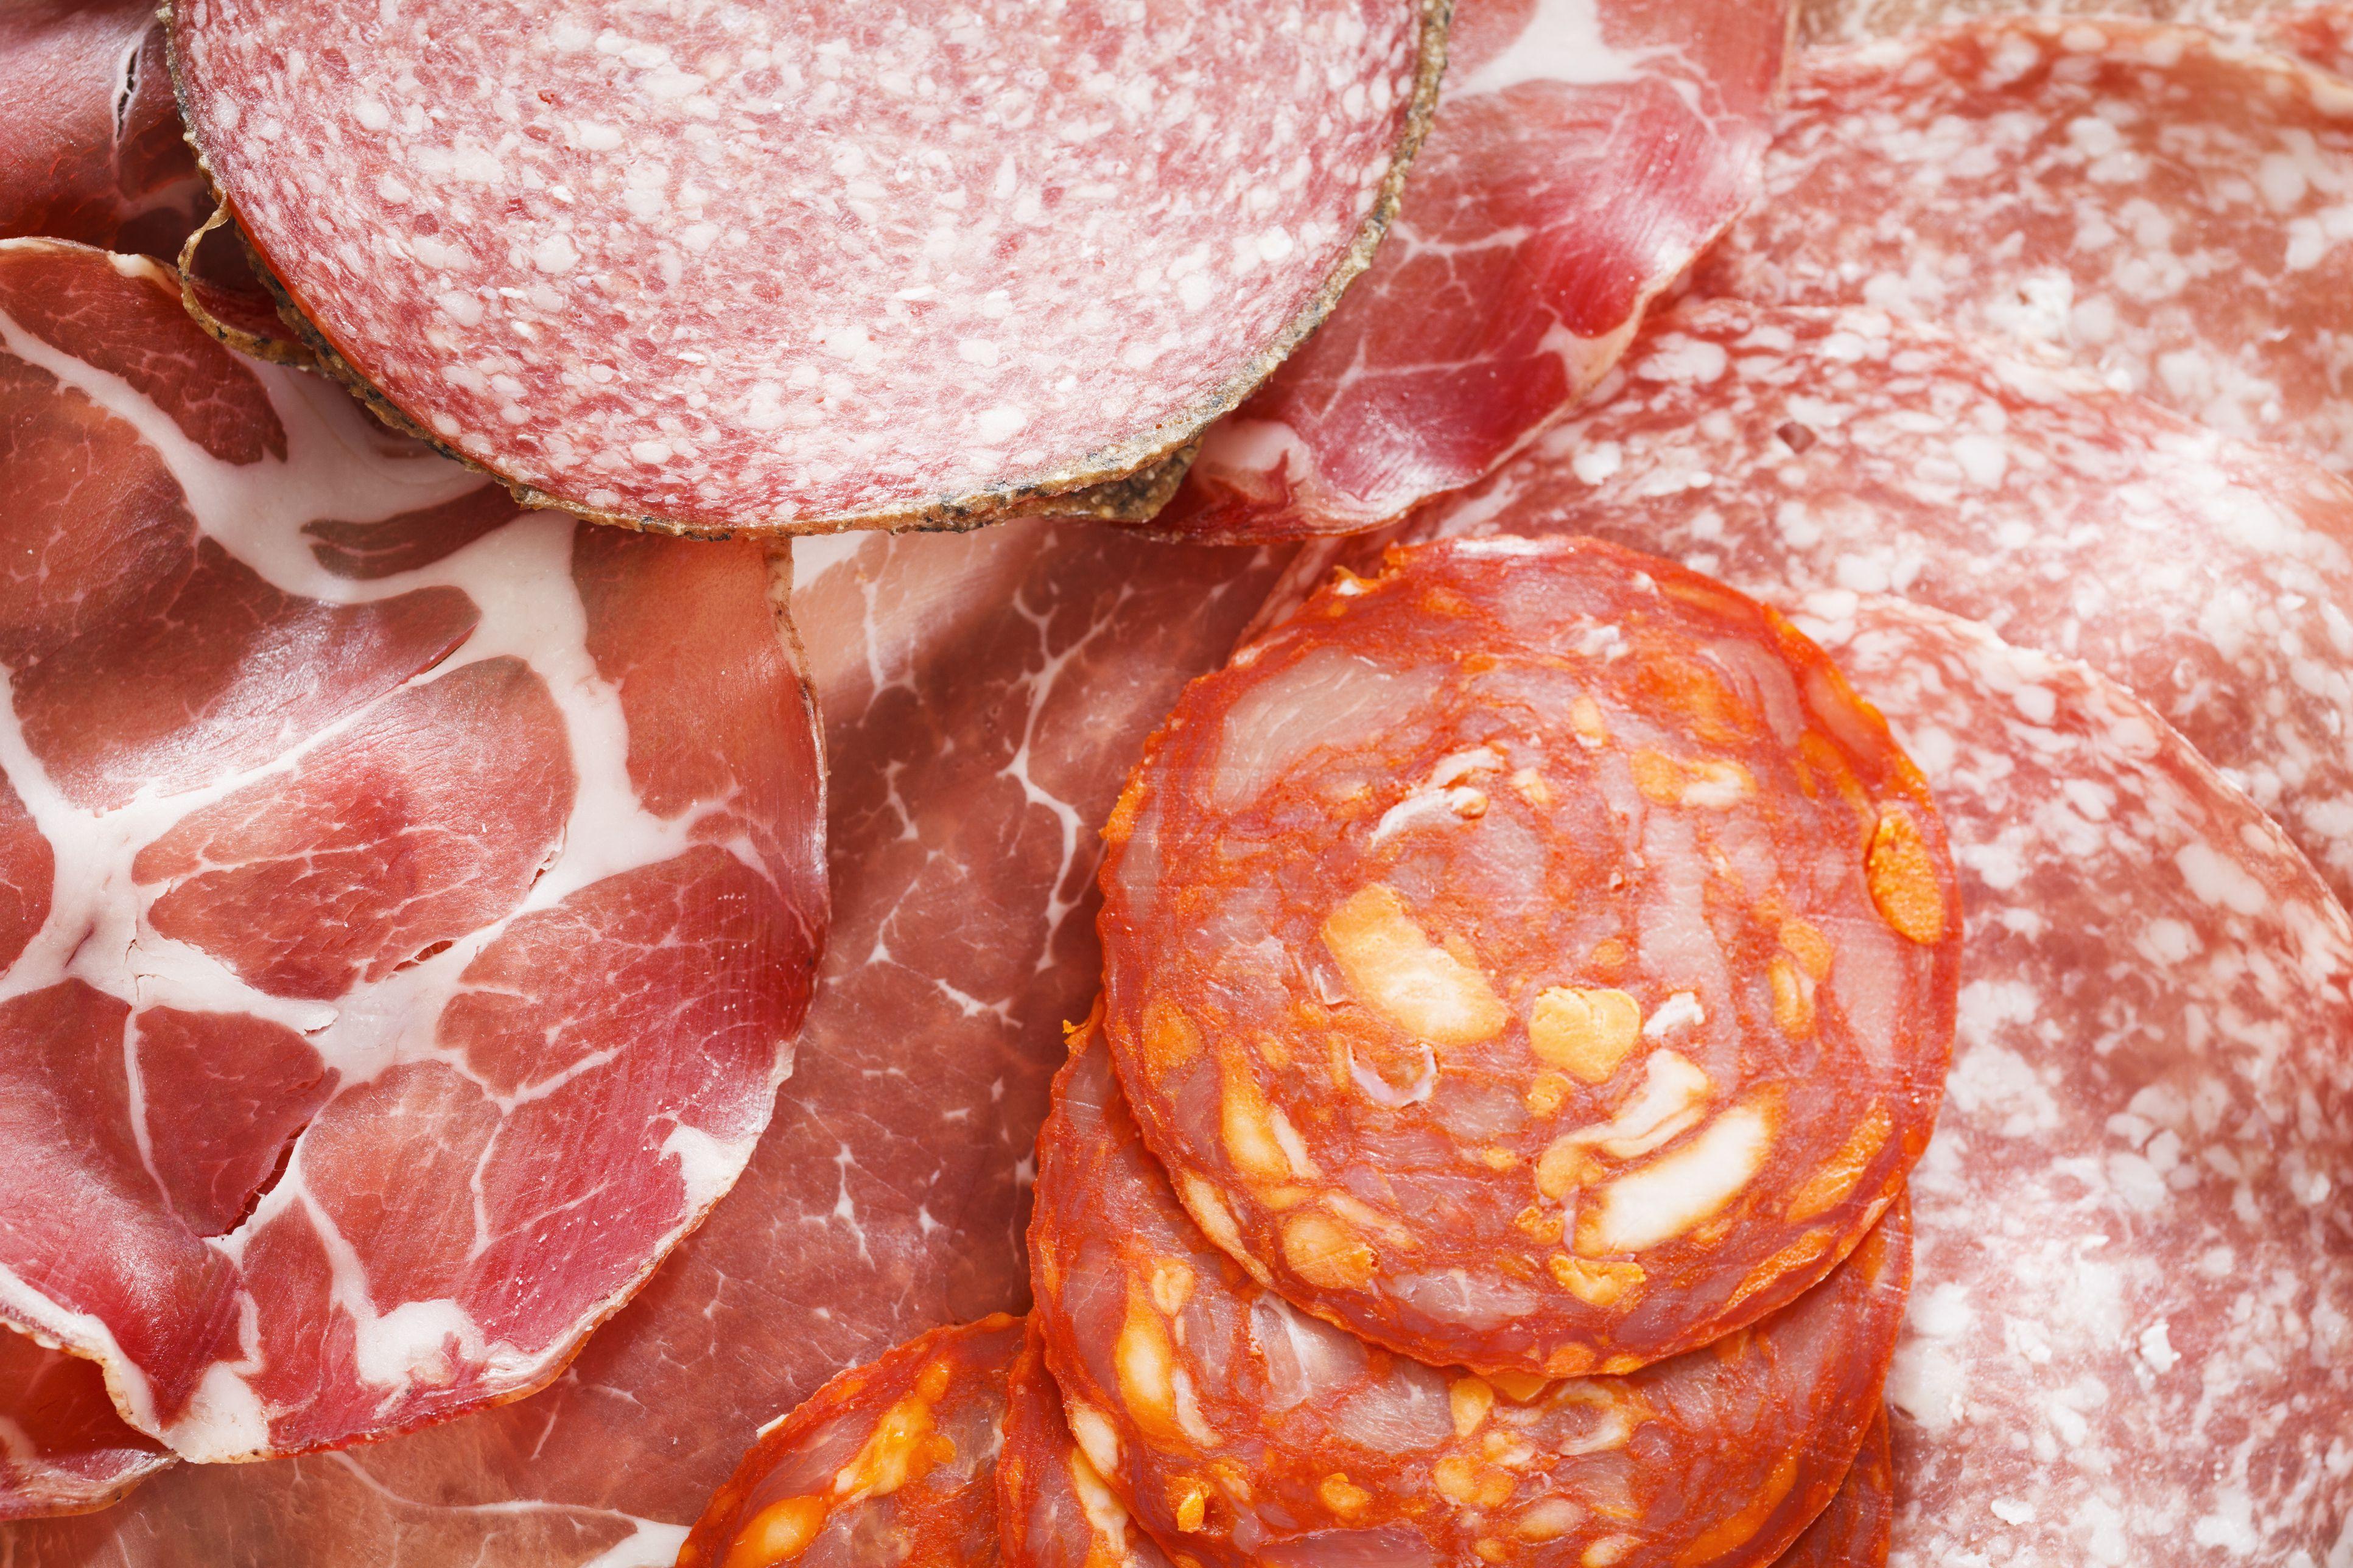 Selection of fresh sliced meat salami